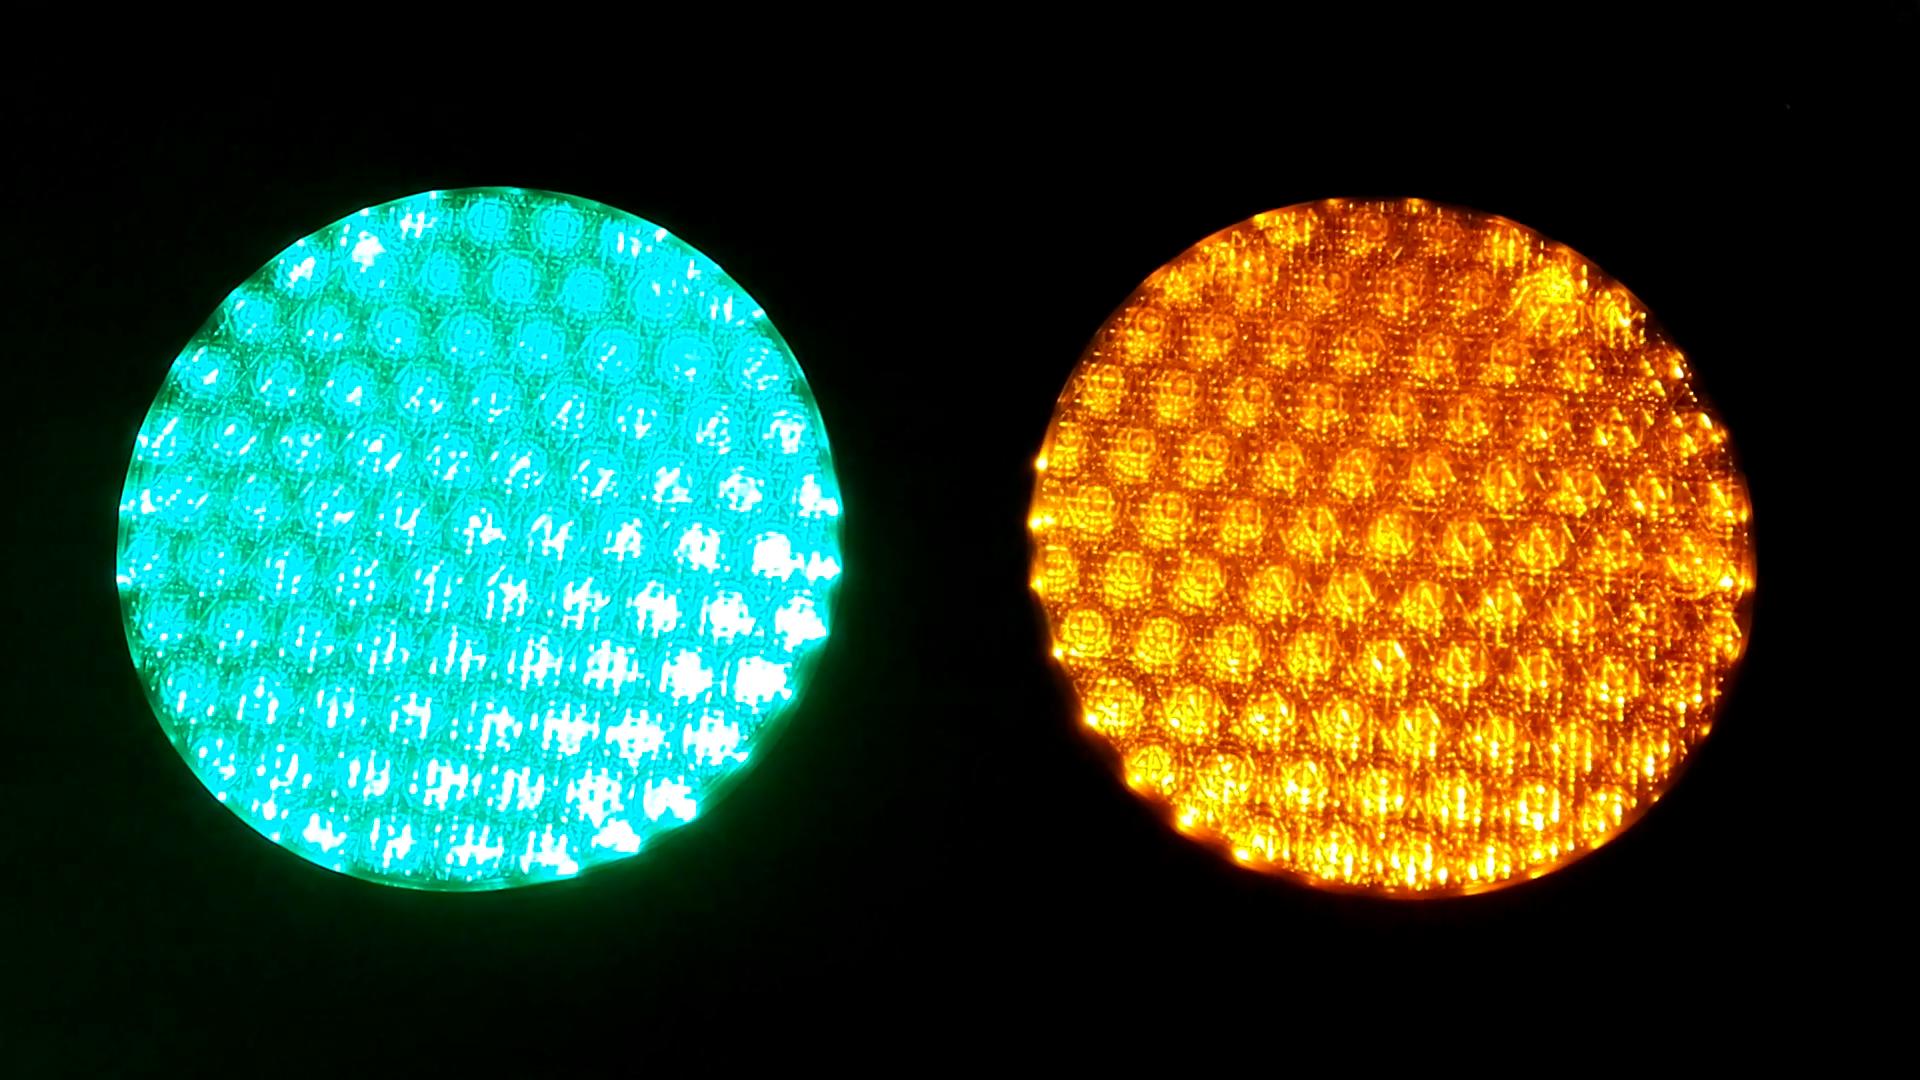 200mm voll ball Rot Gelb Grün LED verkehrs signal licht mit cobweb objektiv